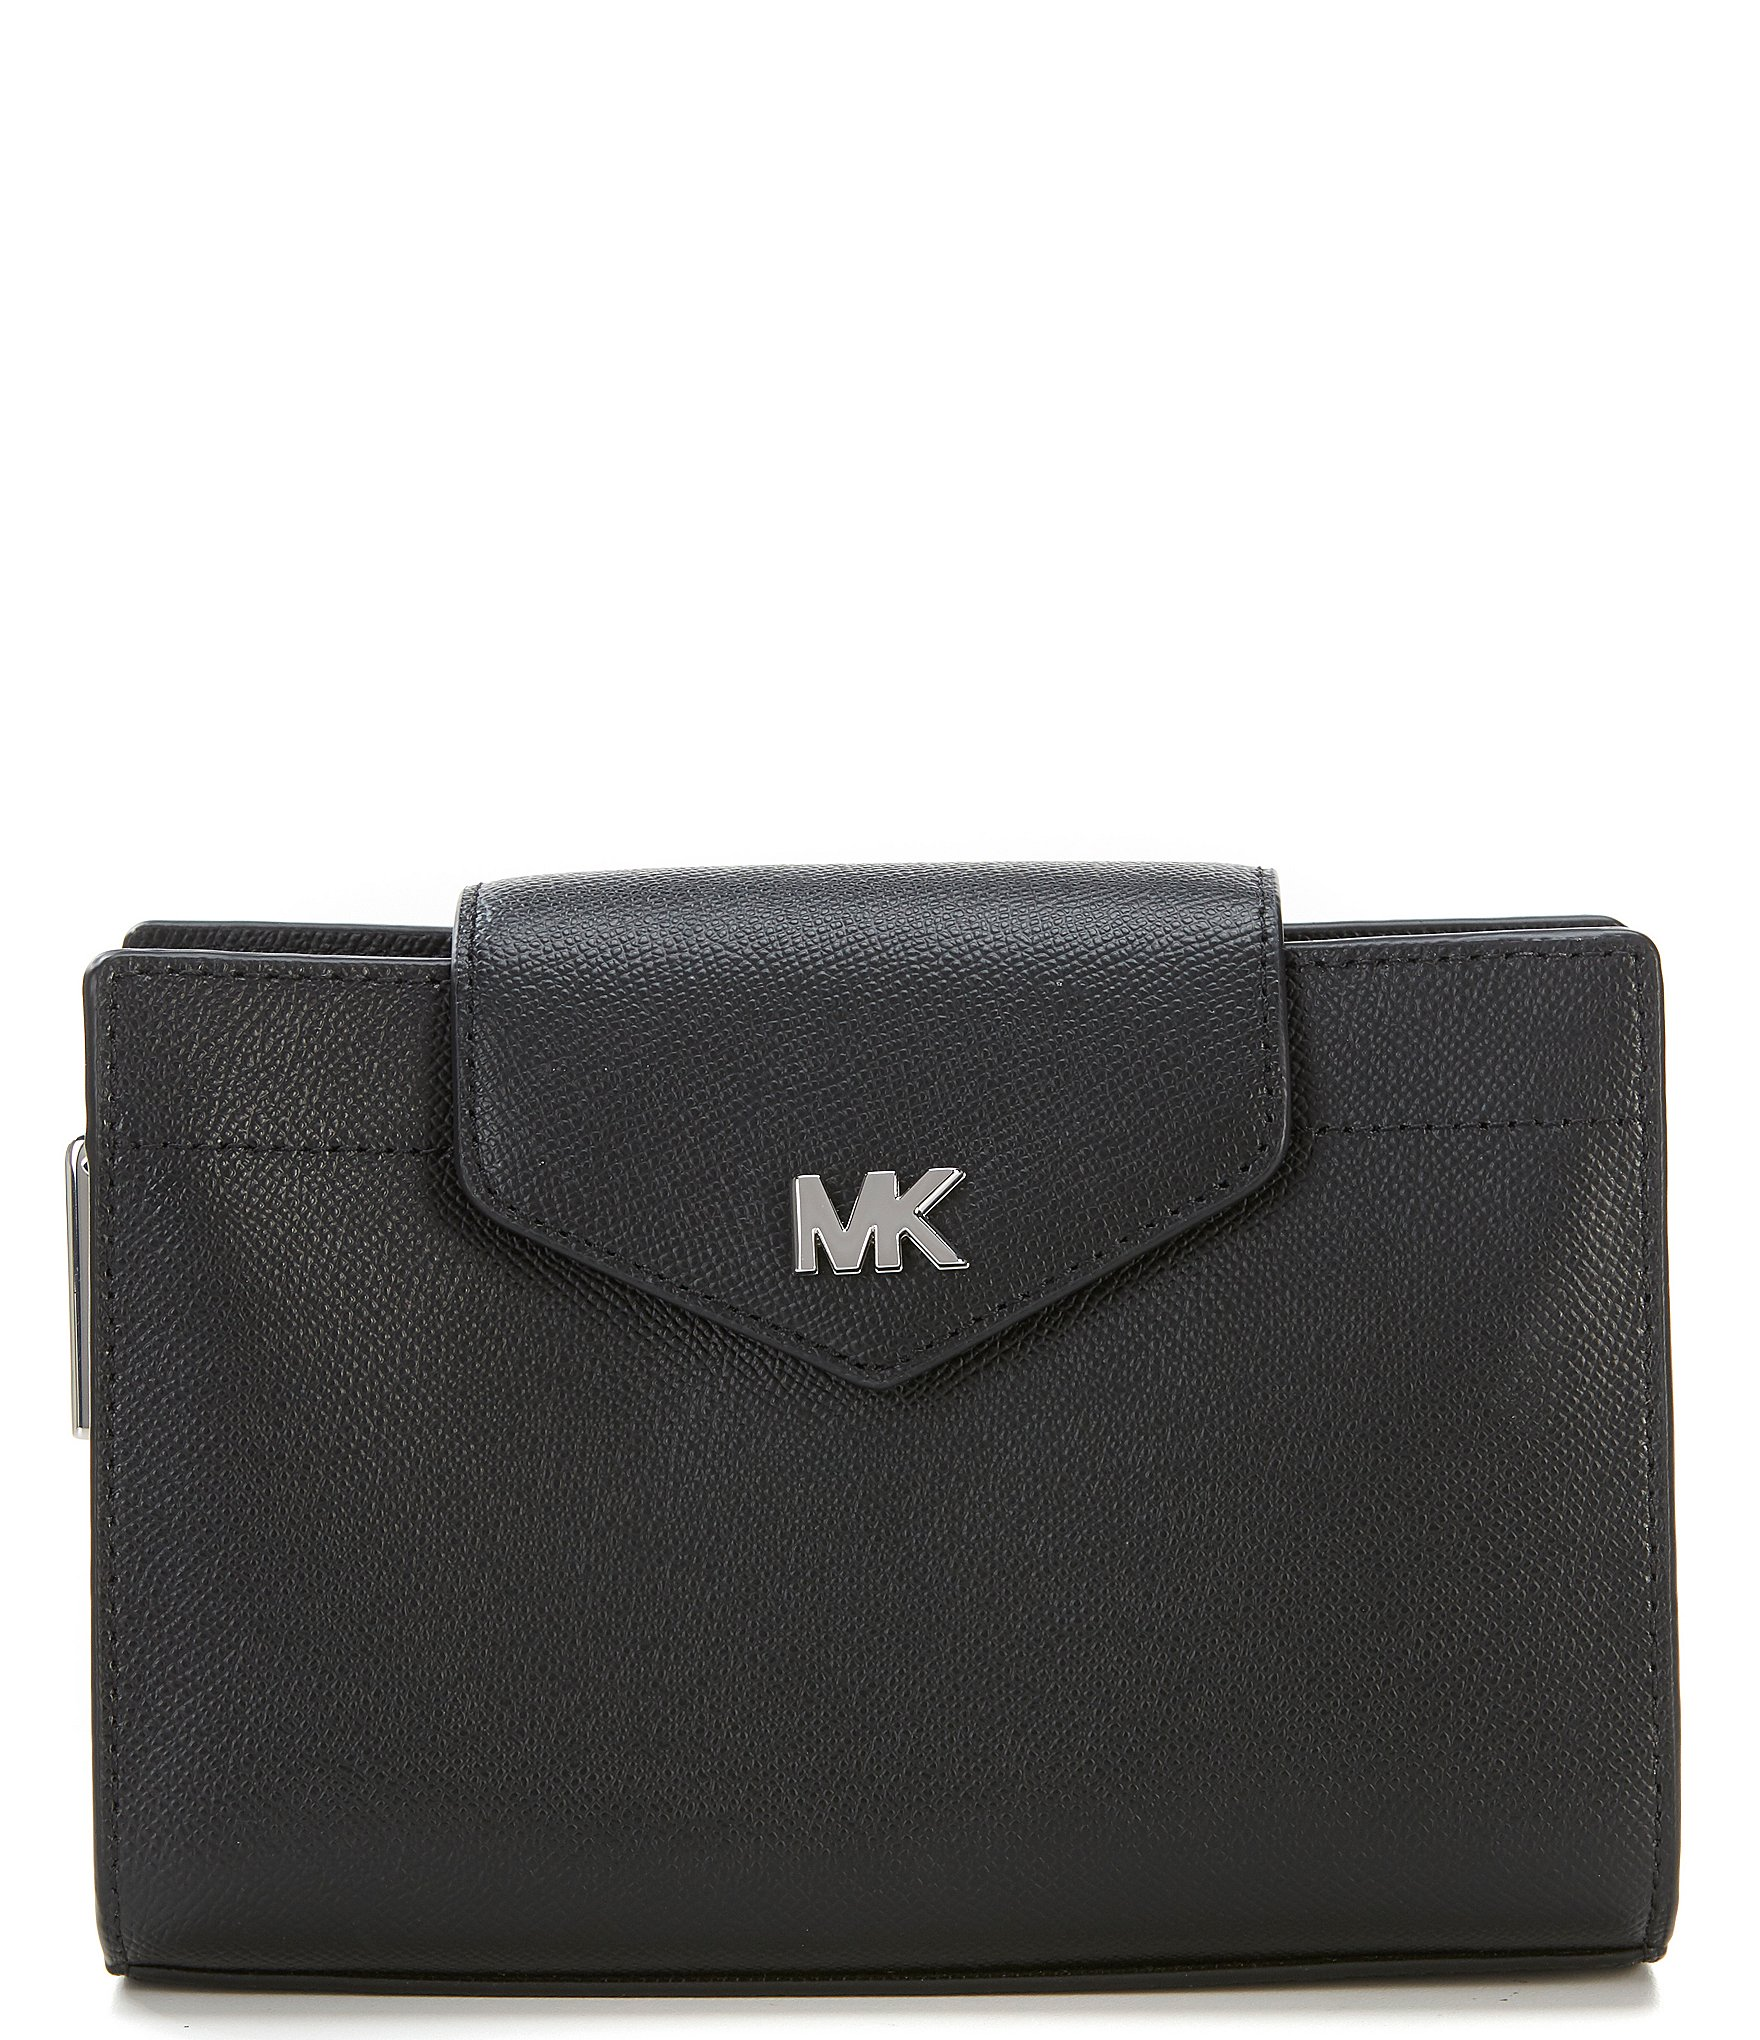 fe98e504bb5c black bag on snap: Handbags, Purses & Wallets   Dillard's   Dillard's